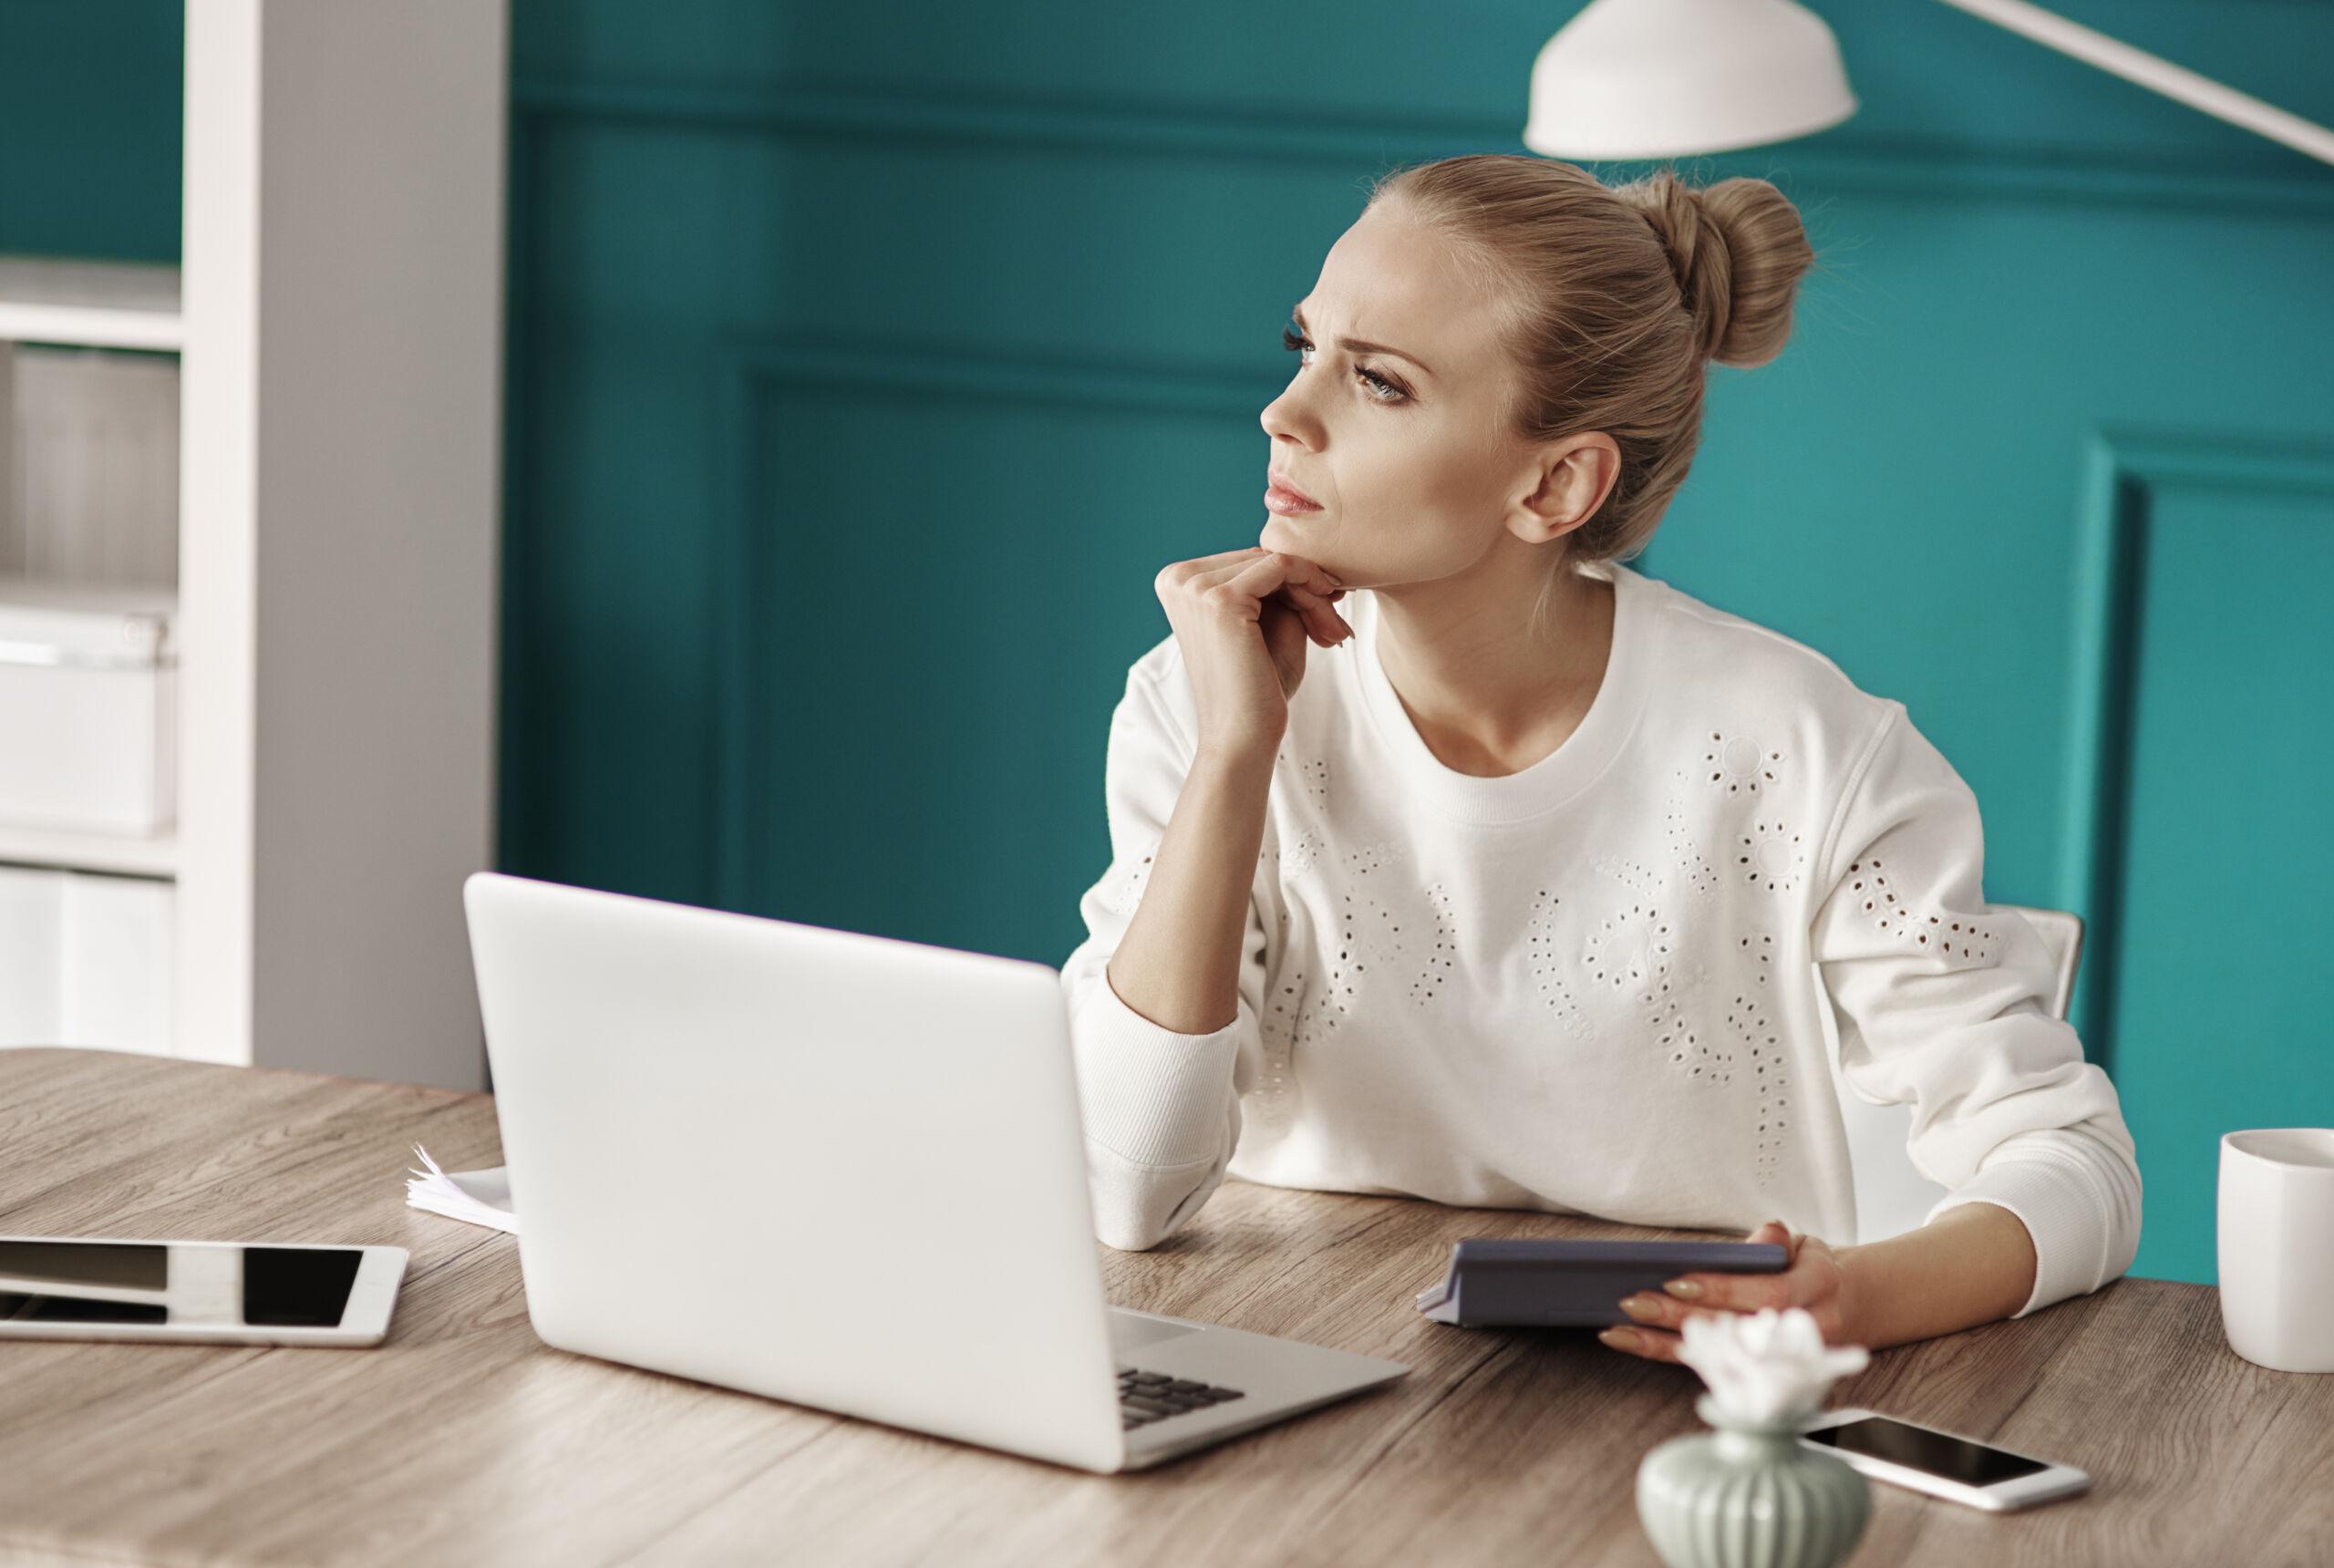 Virtual Customer Service Reps: Victoria's Secret Hiring!